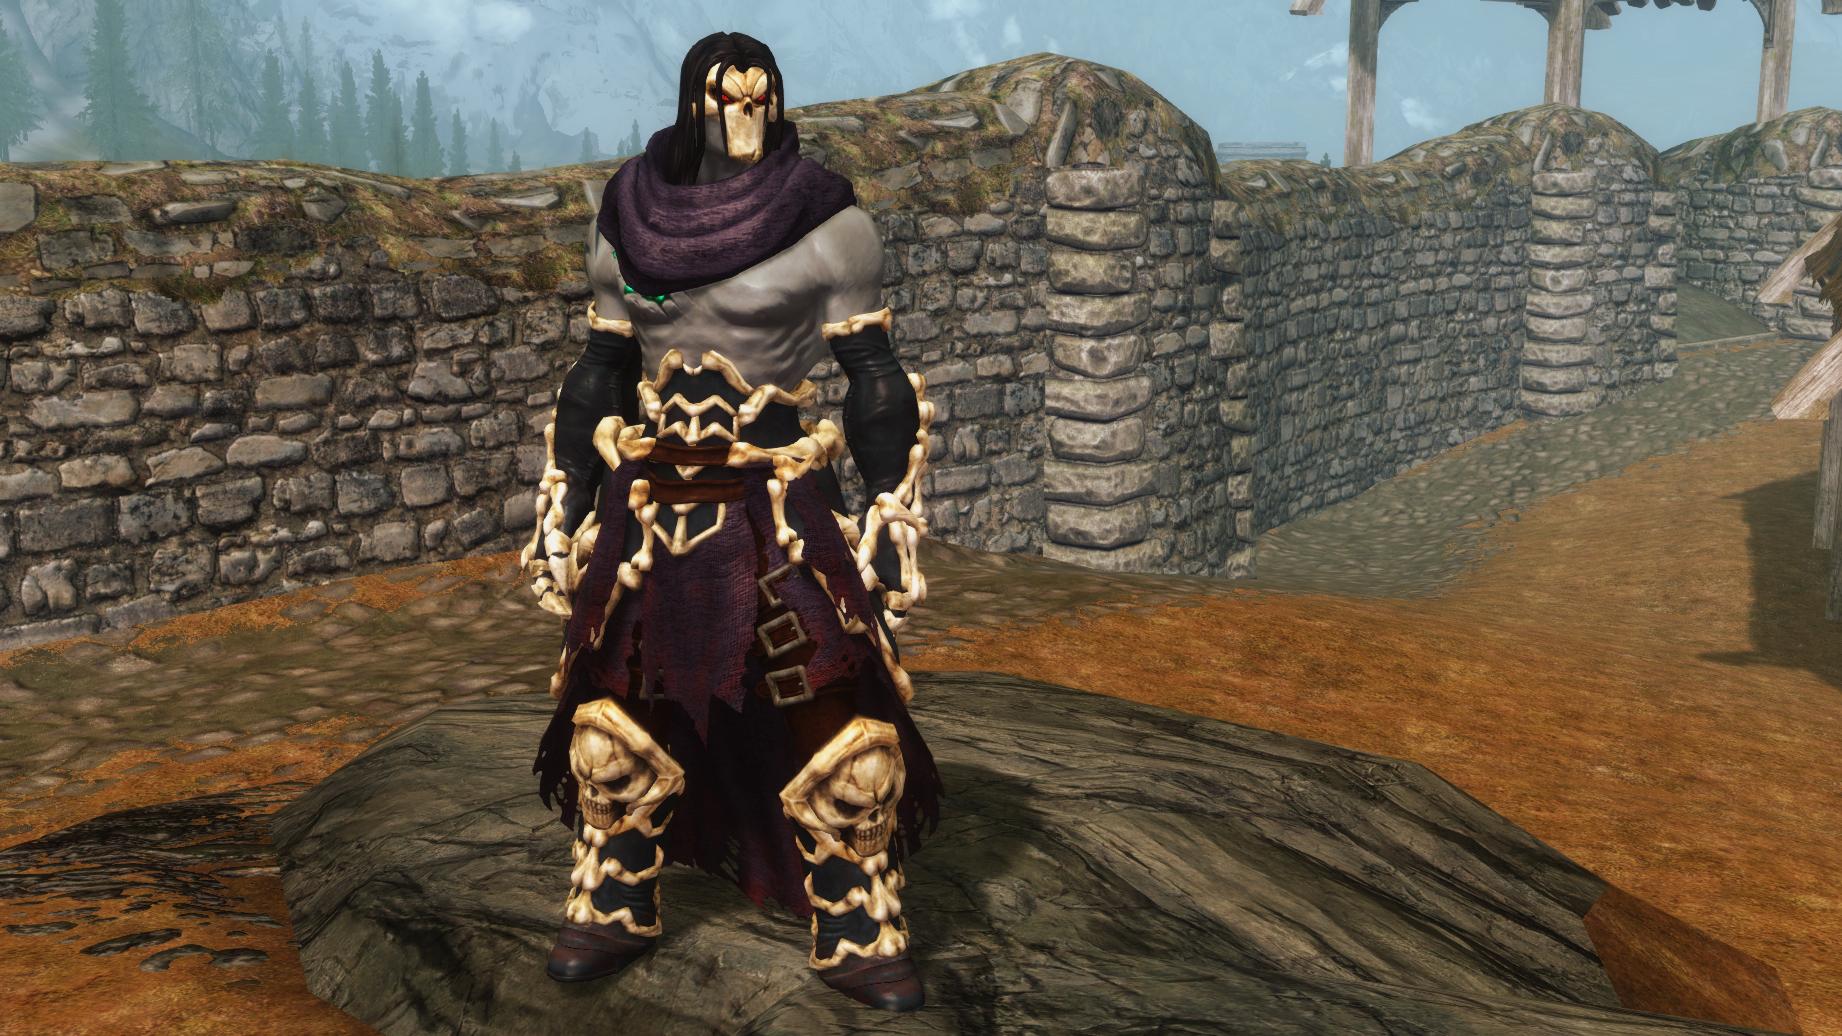 Death Necromancer armor 02 by Ryushenron on DeviantArt